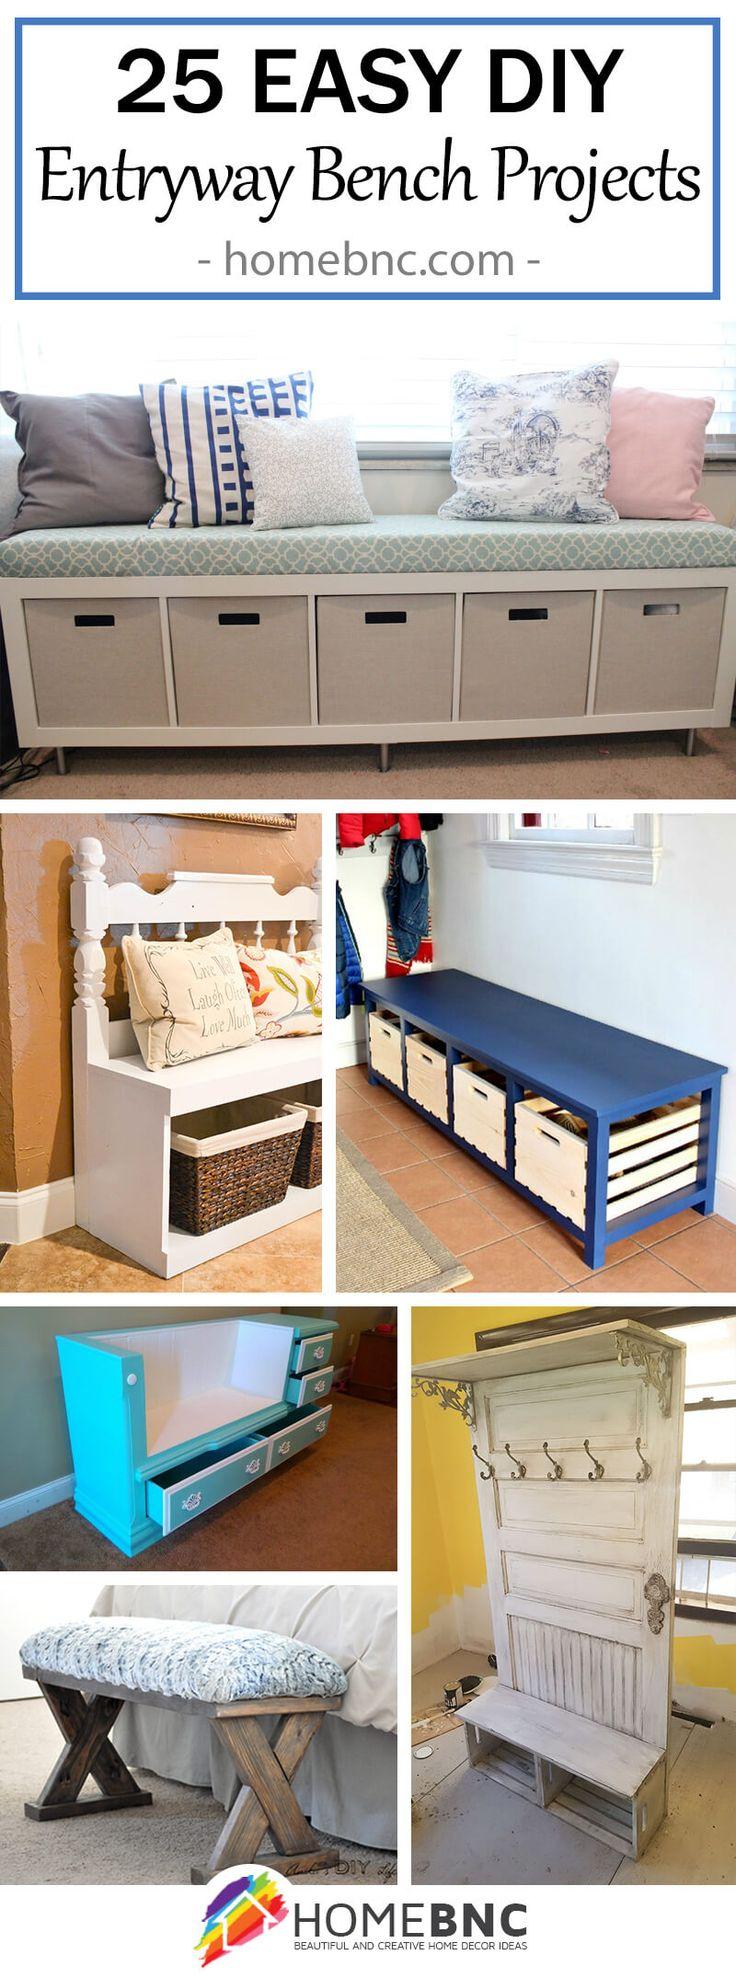 best 25 entryway bench storage ideas on pinterest diy. Black Bedroom Furniture Sets. Home Design Ideas